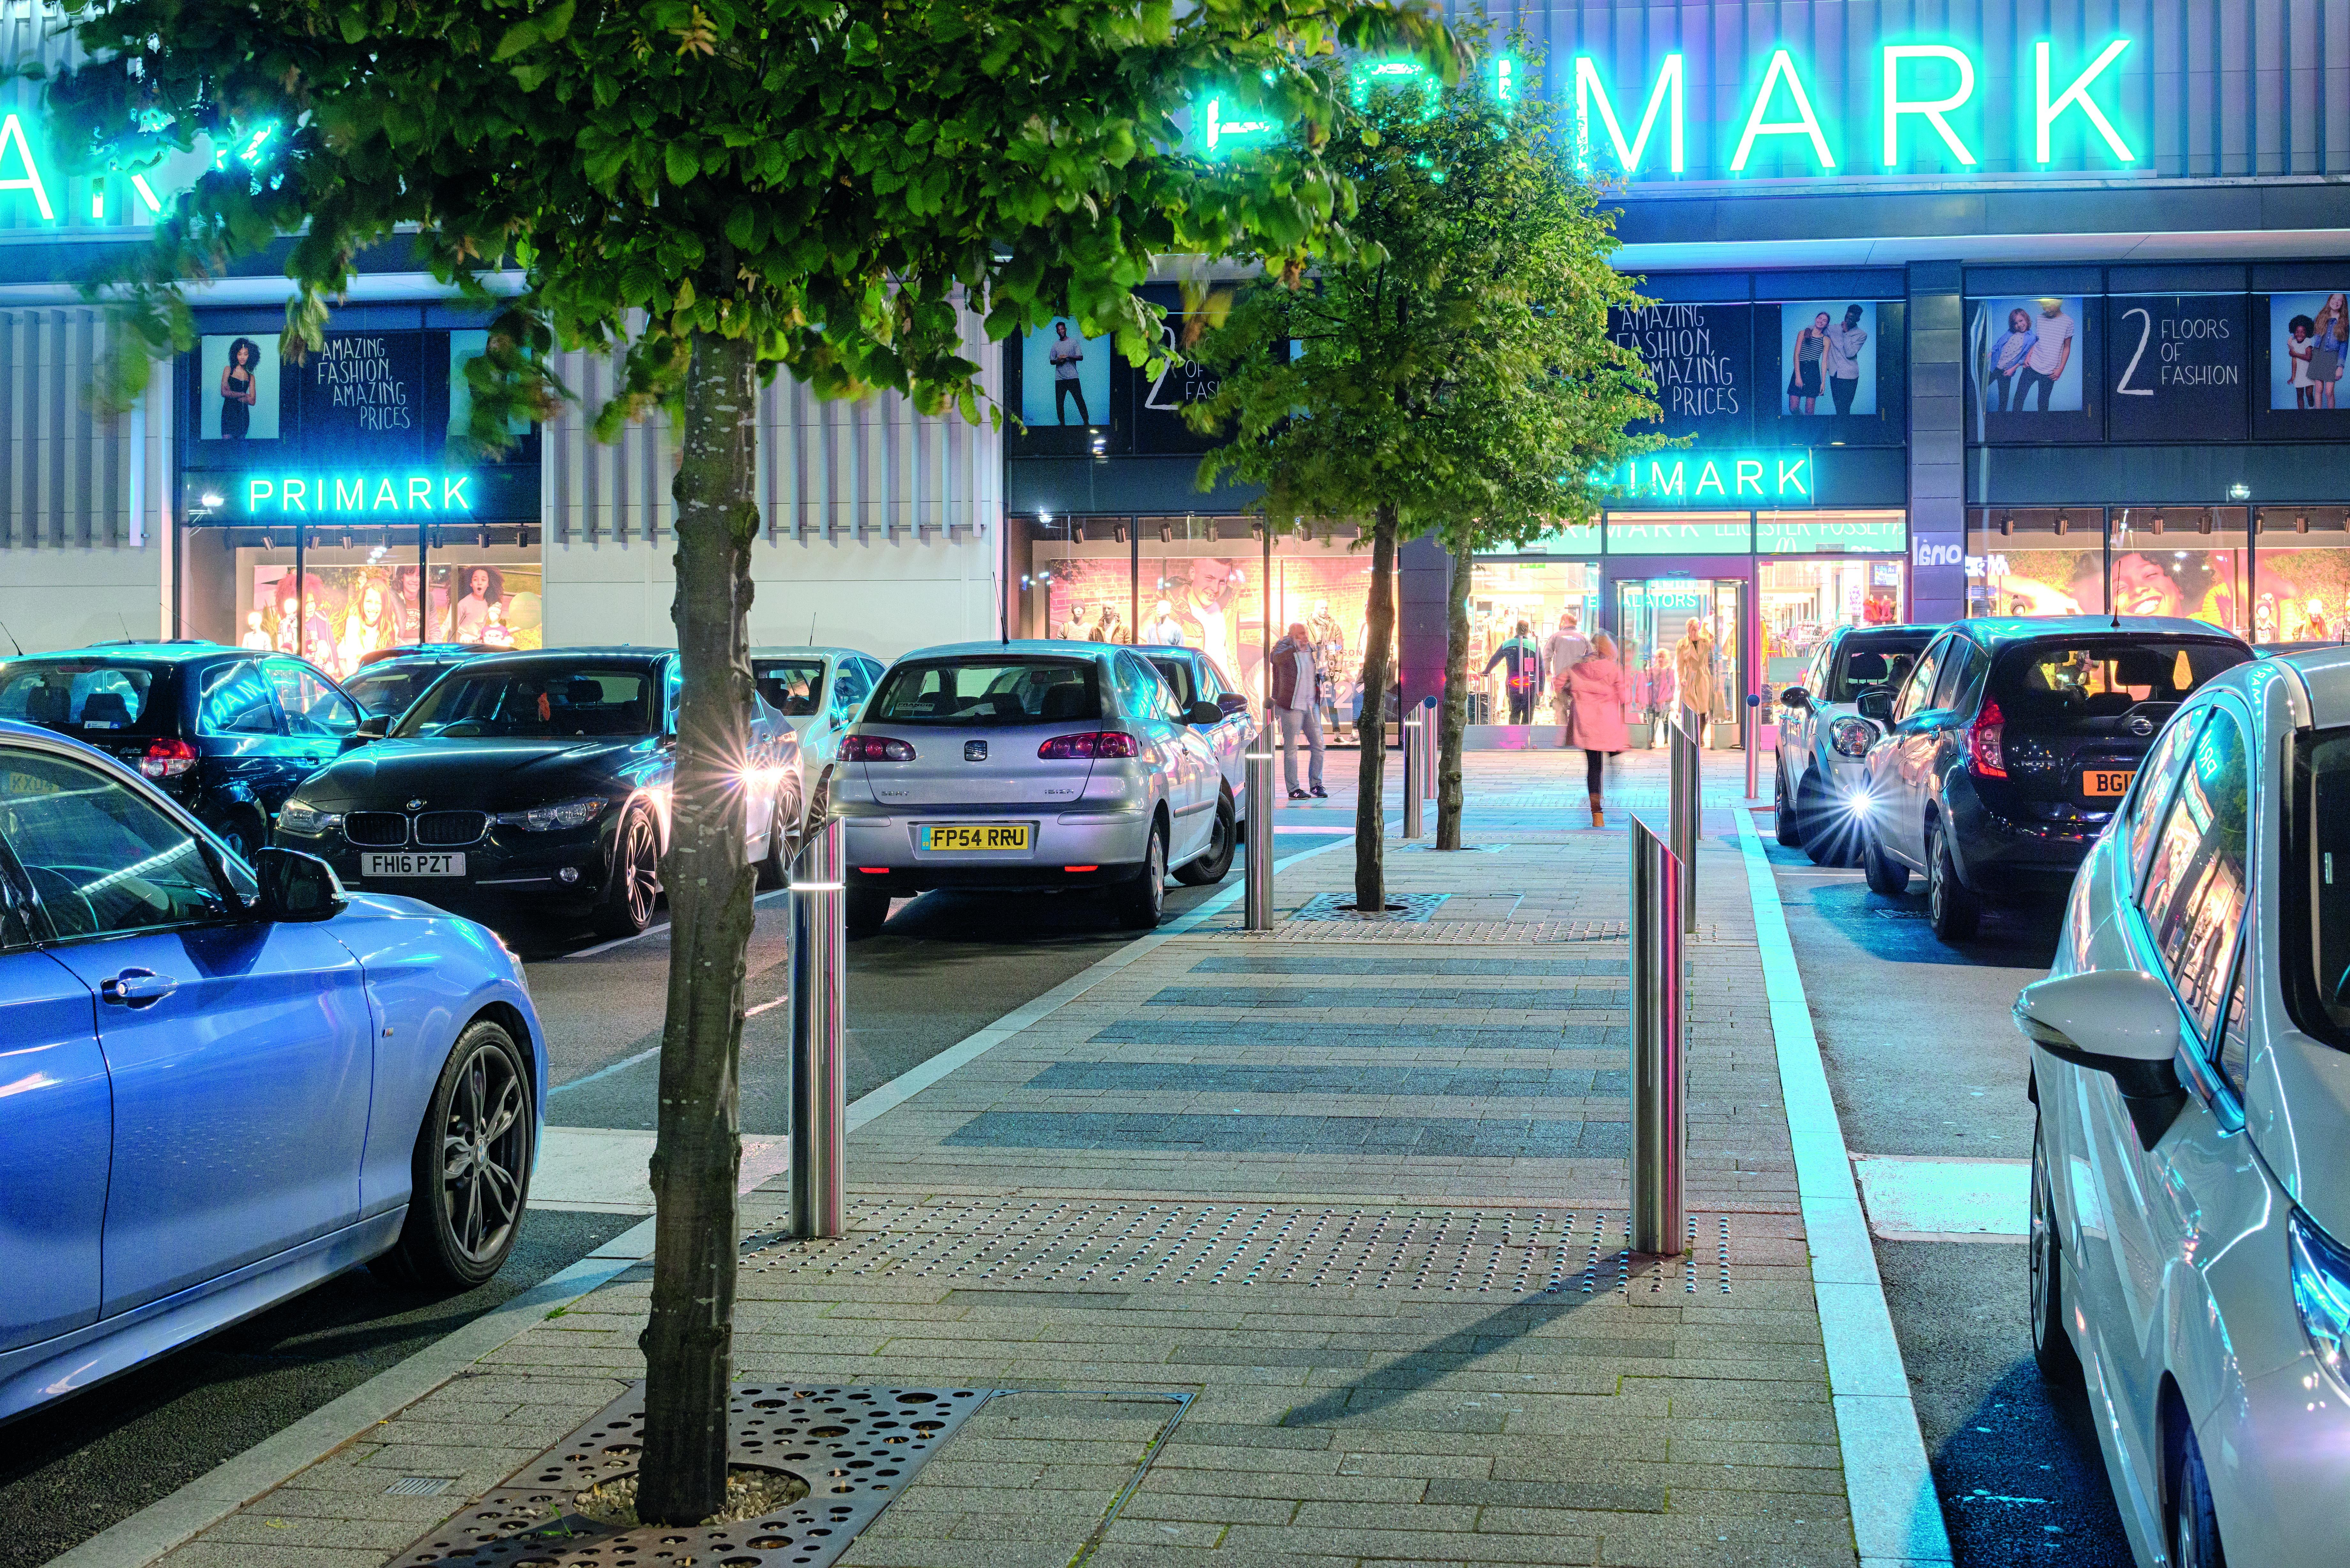 Primark car park using Marshalls bollards